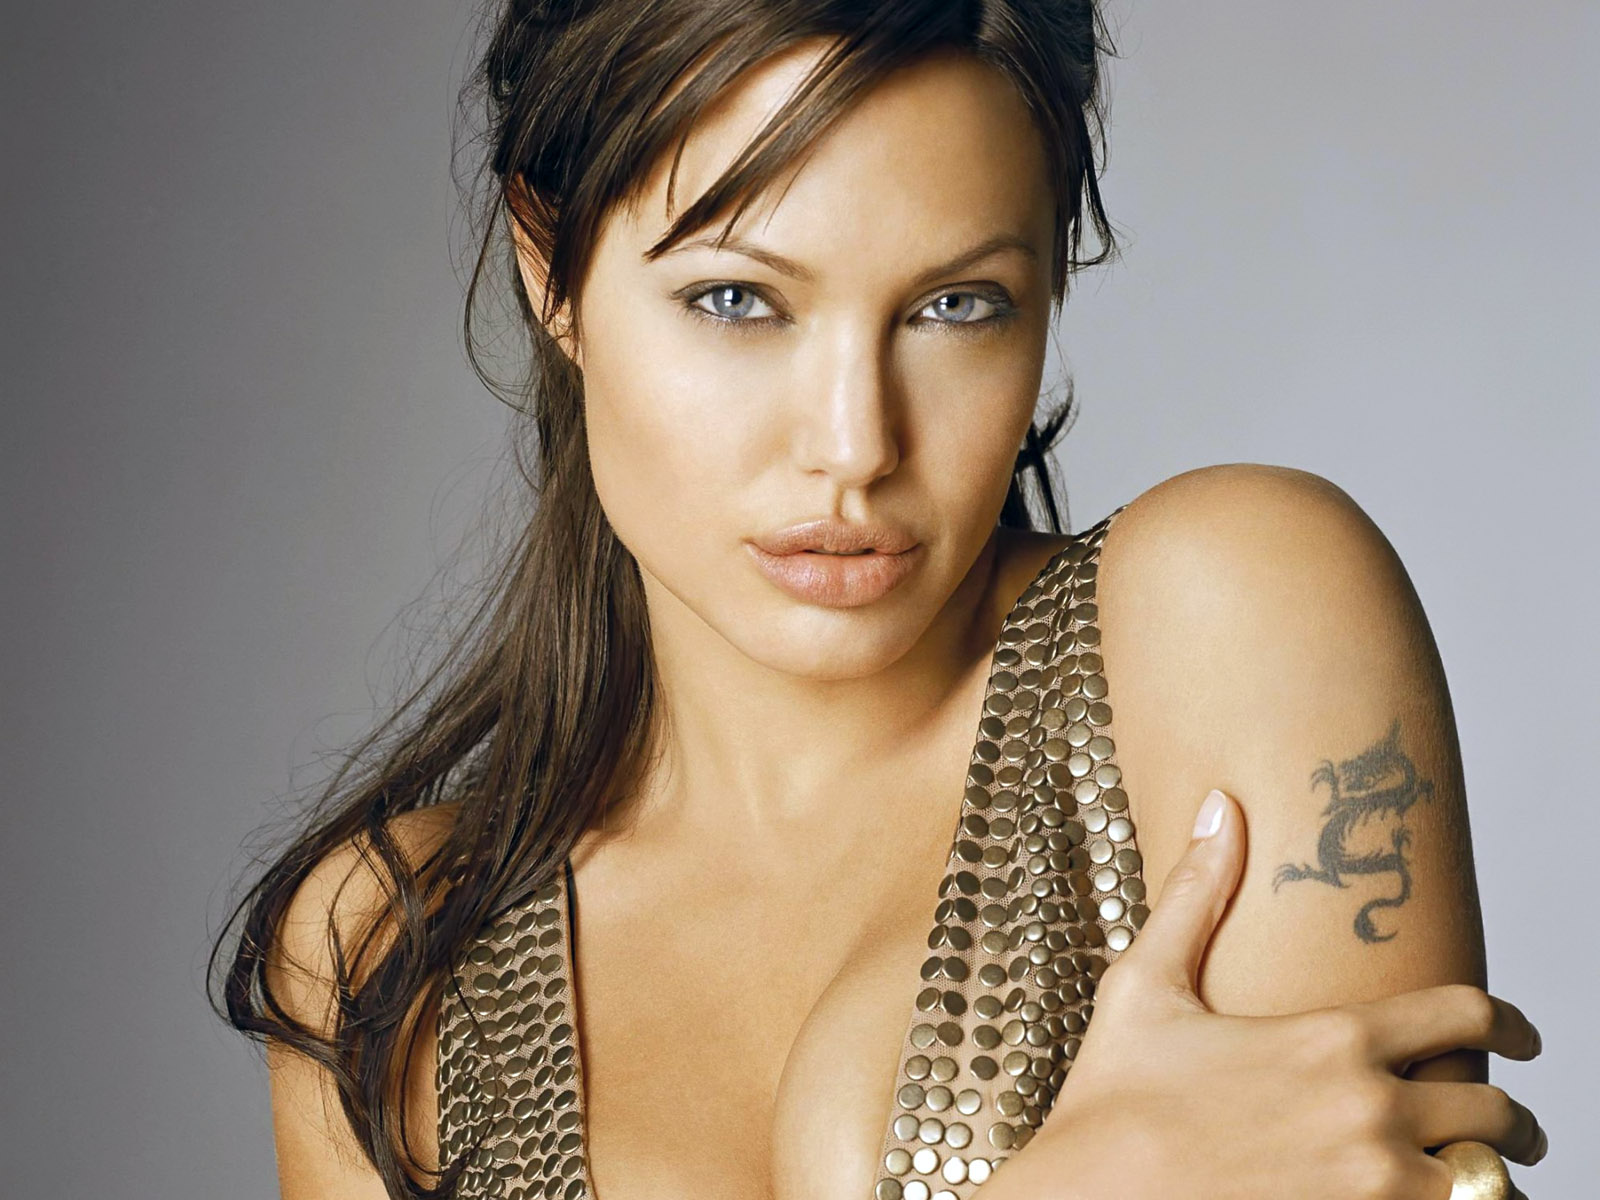 jesus tattoos for men rihanna tribal hand tattoo 05